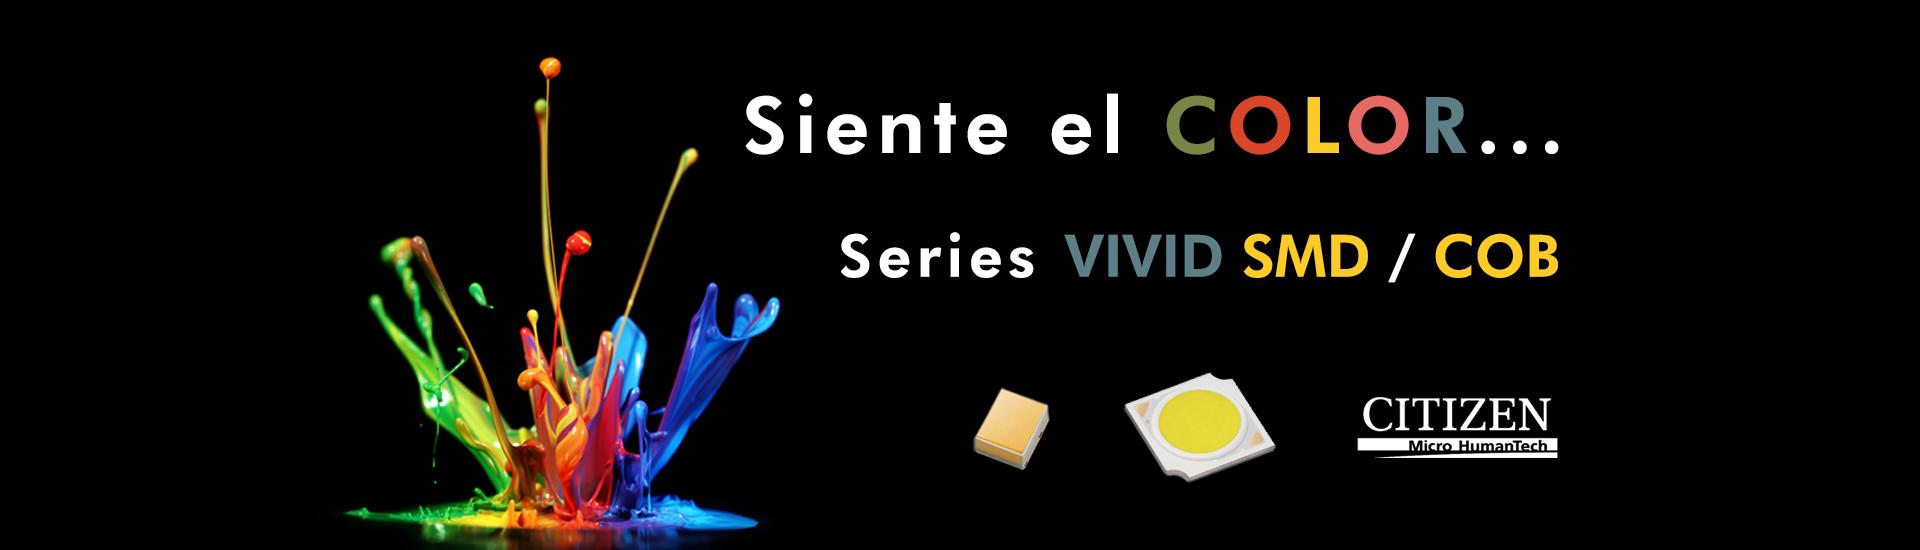 Series VIVID SMD / COB